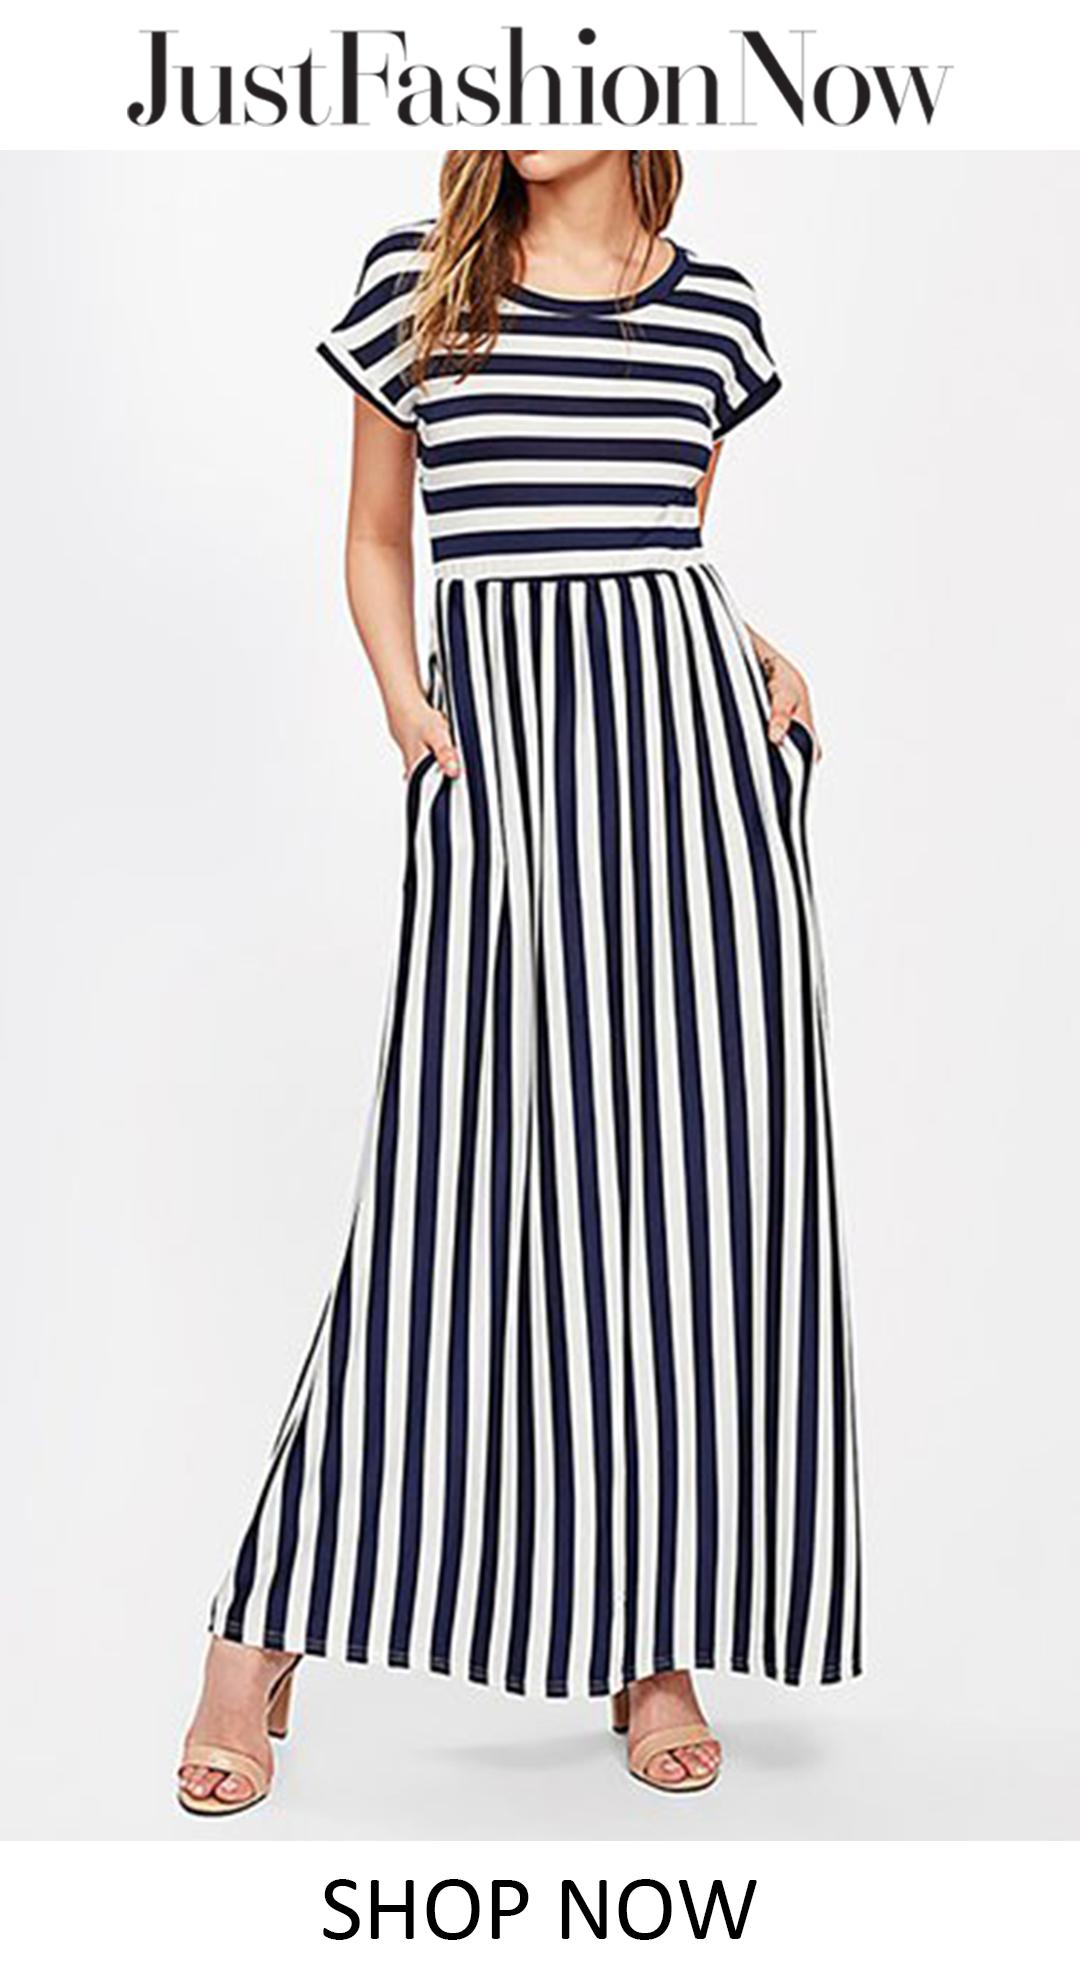 20 59 A Line Women Beach Holiday Short Sleeve Cotton Striped Summer Dress Vestidos Looks Vestido Curto [ 1972 x 1080 Pixel ]